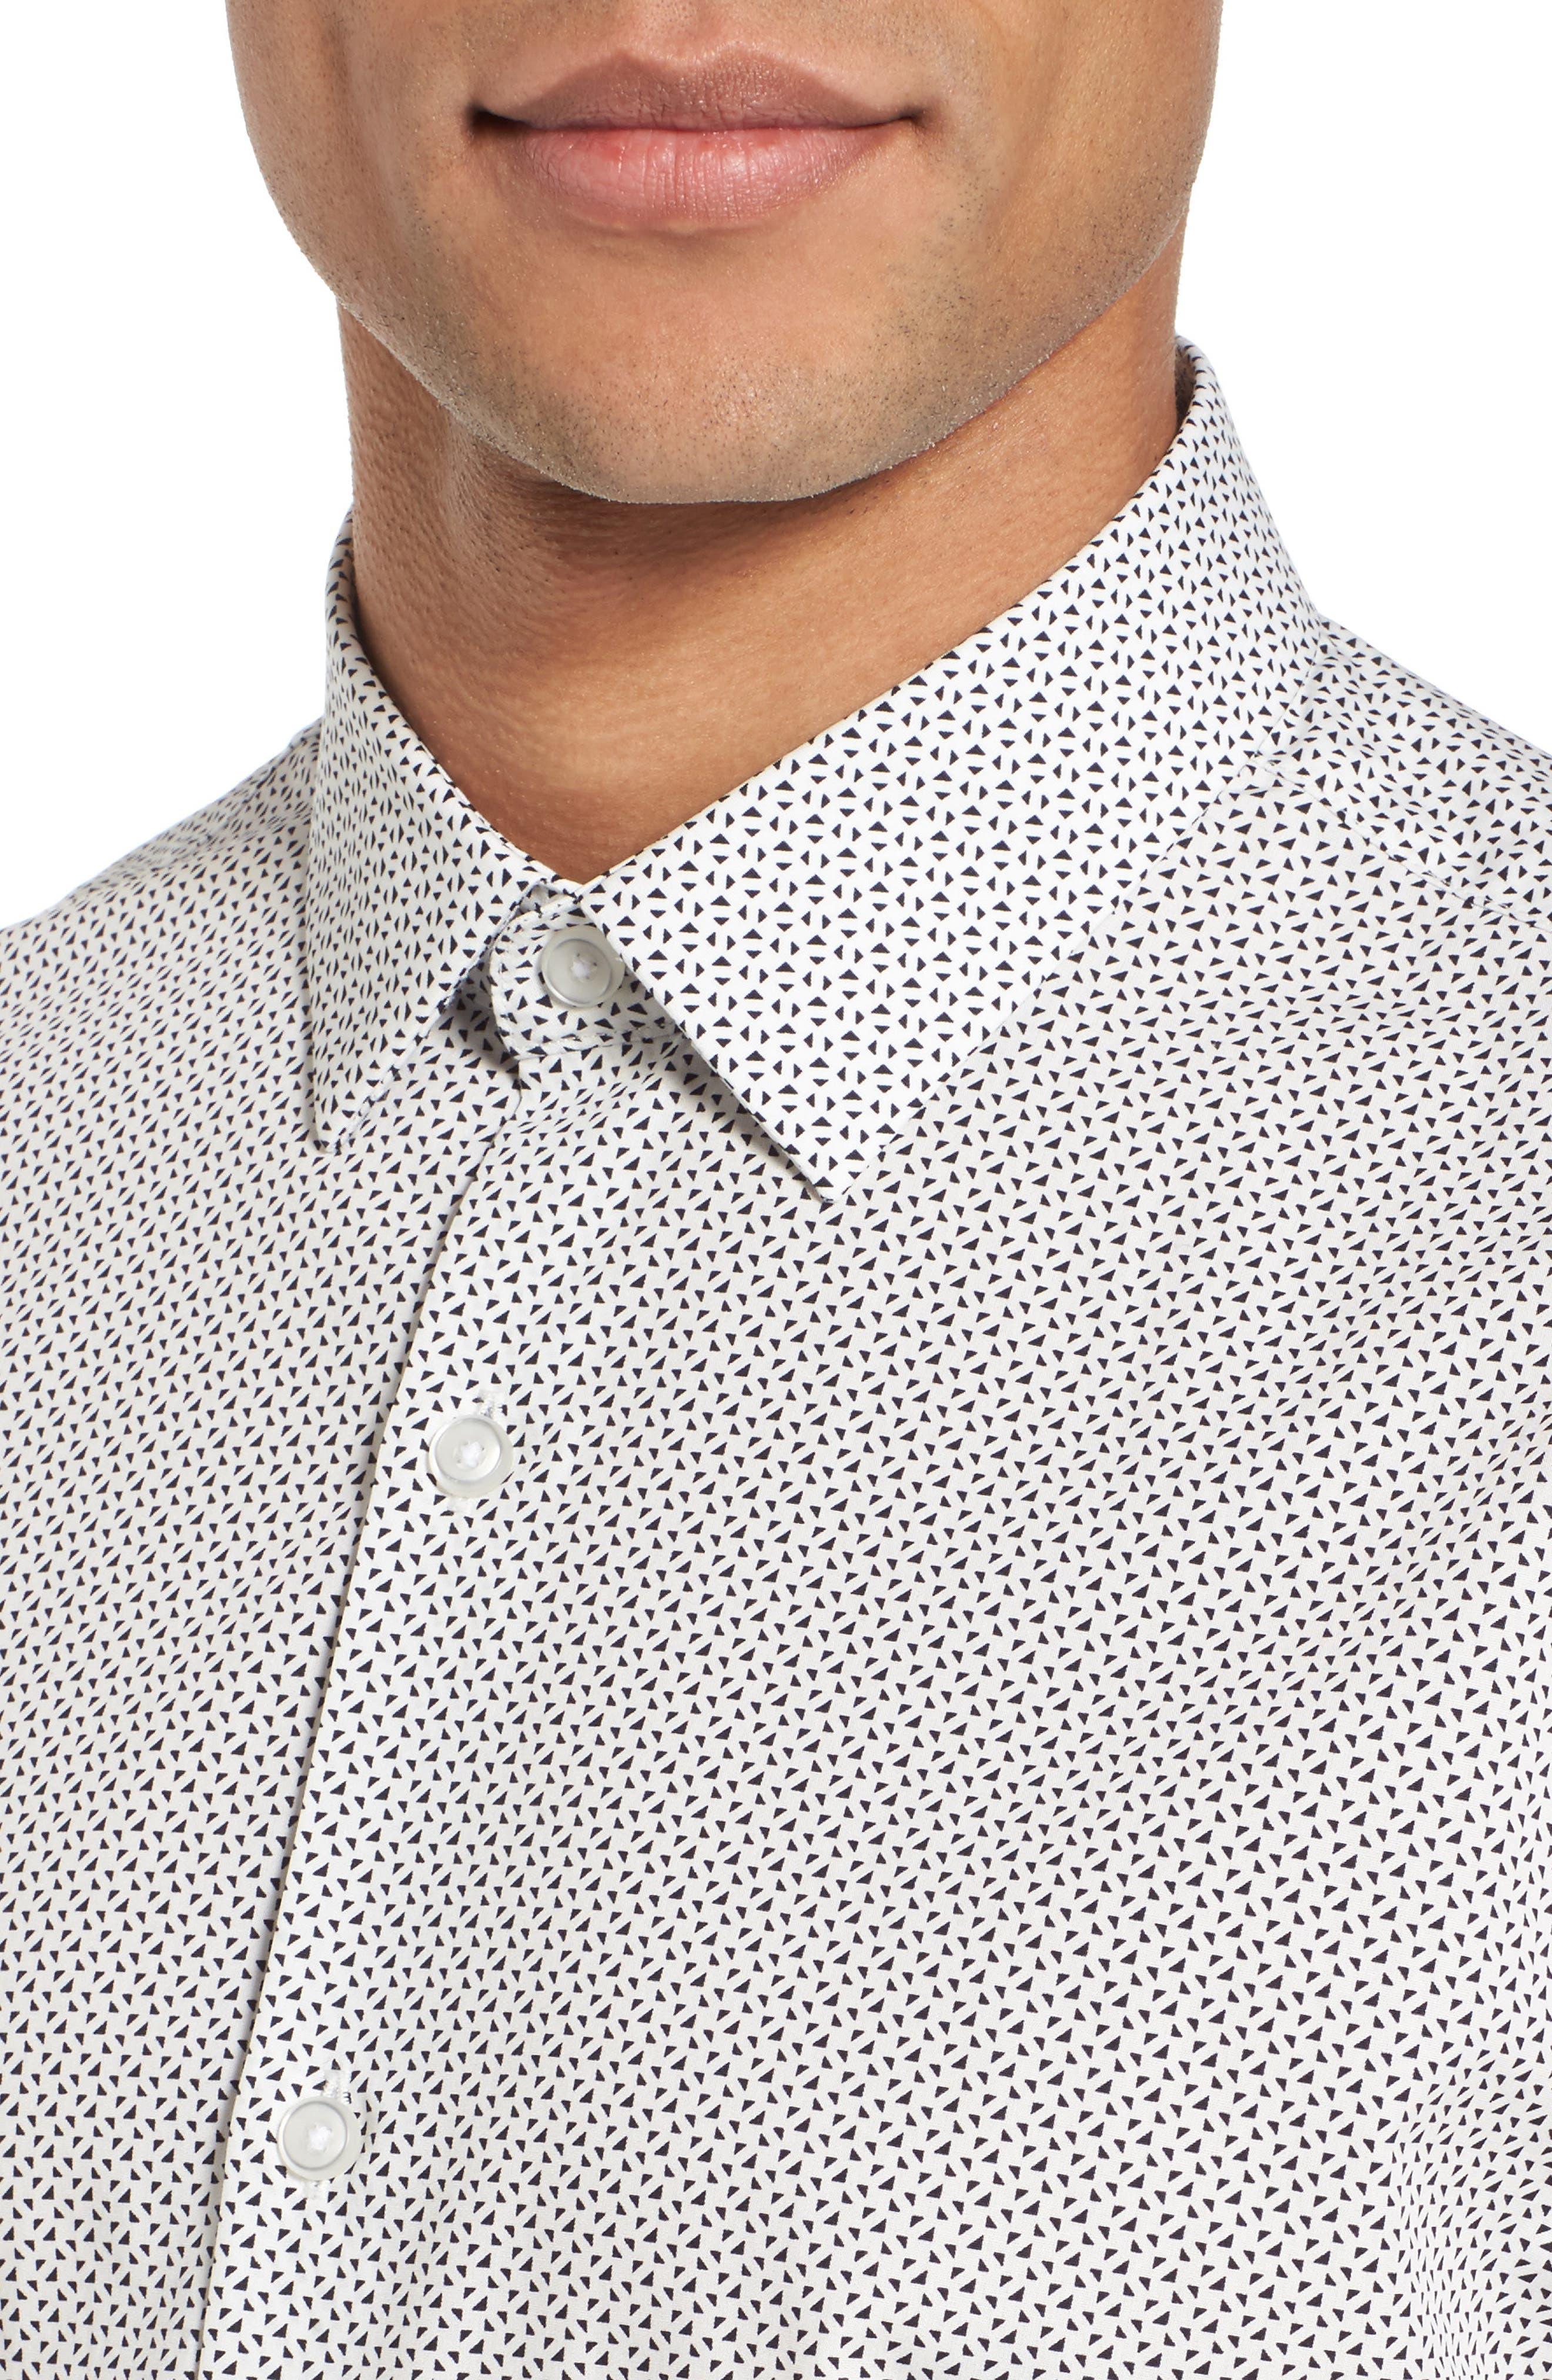 Slim Fit Print Short Sleeve Sport Shirt,                             Alternate thumbnail 4, color,                             White Navy Triangle